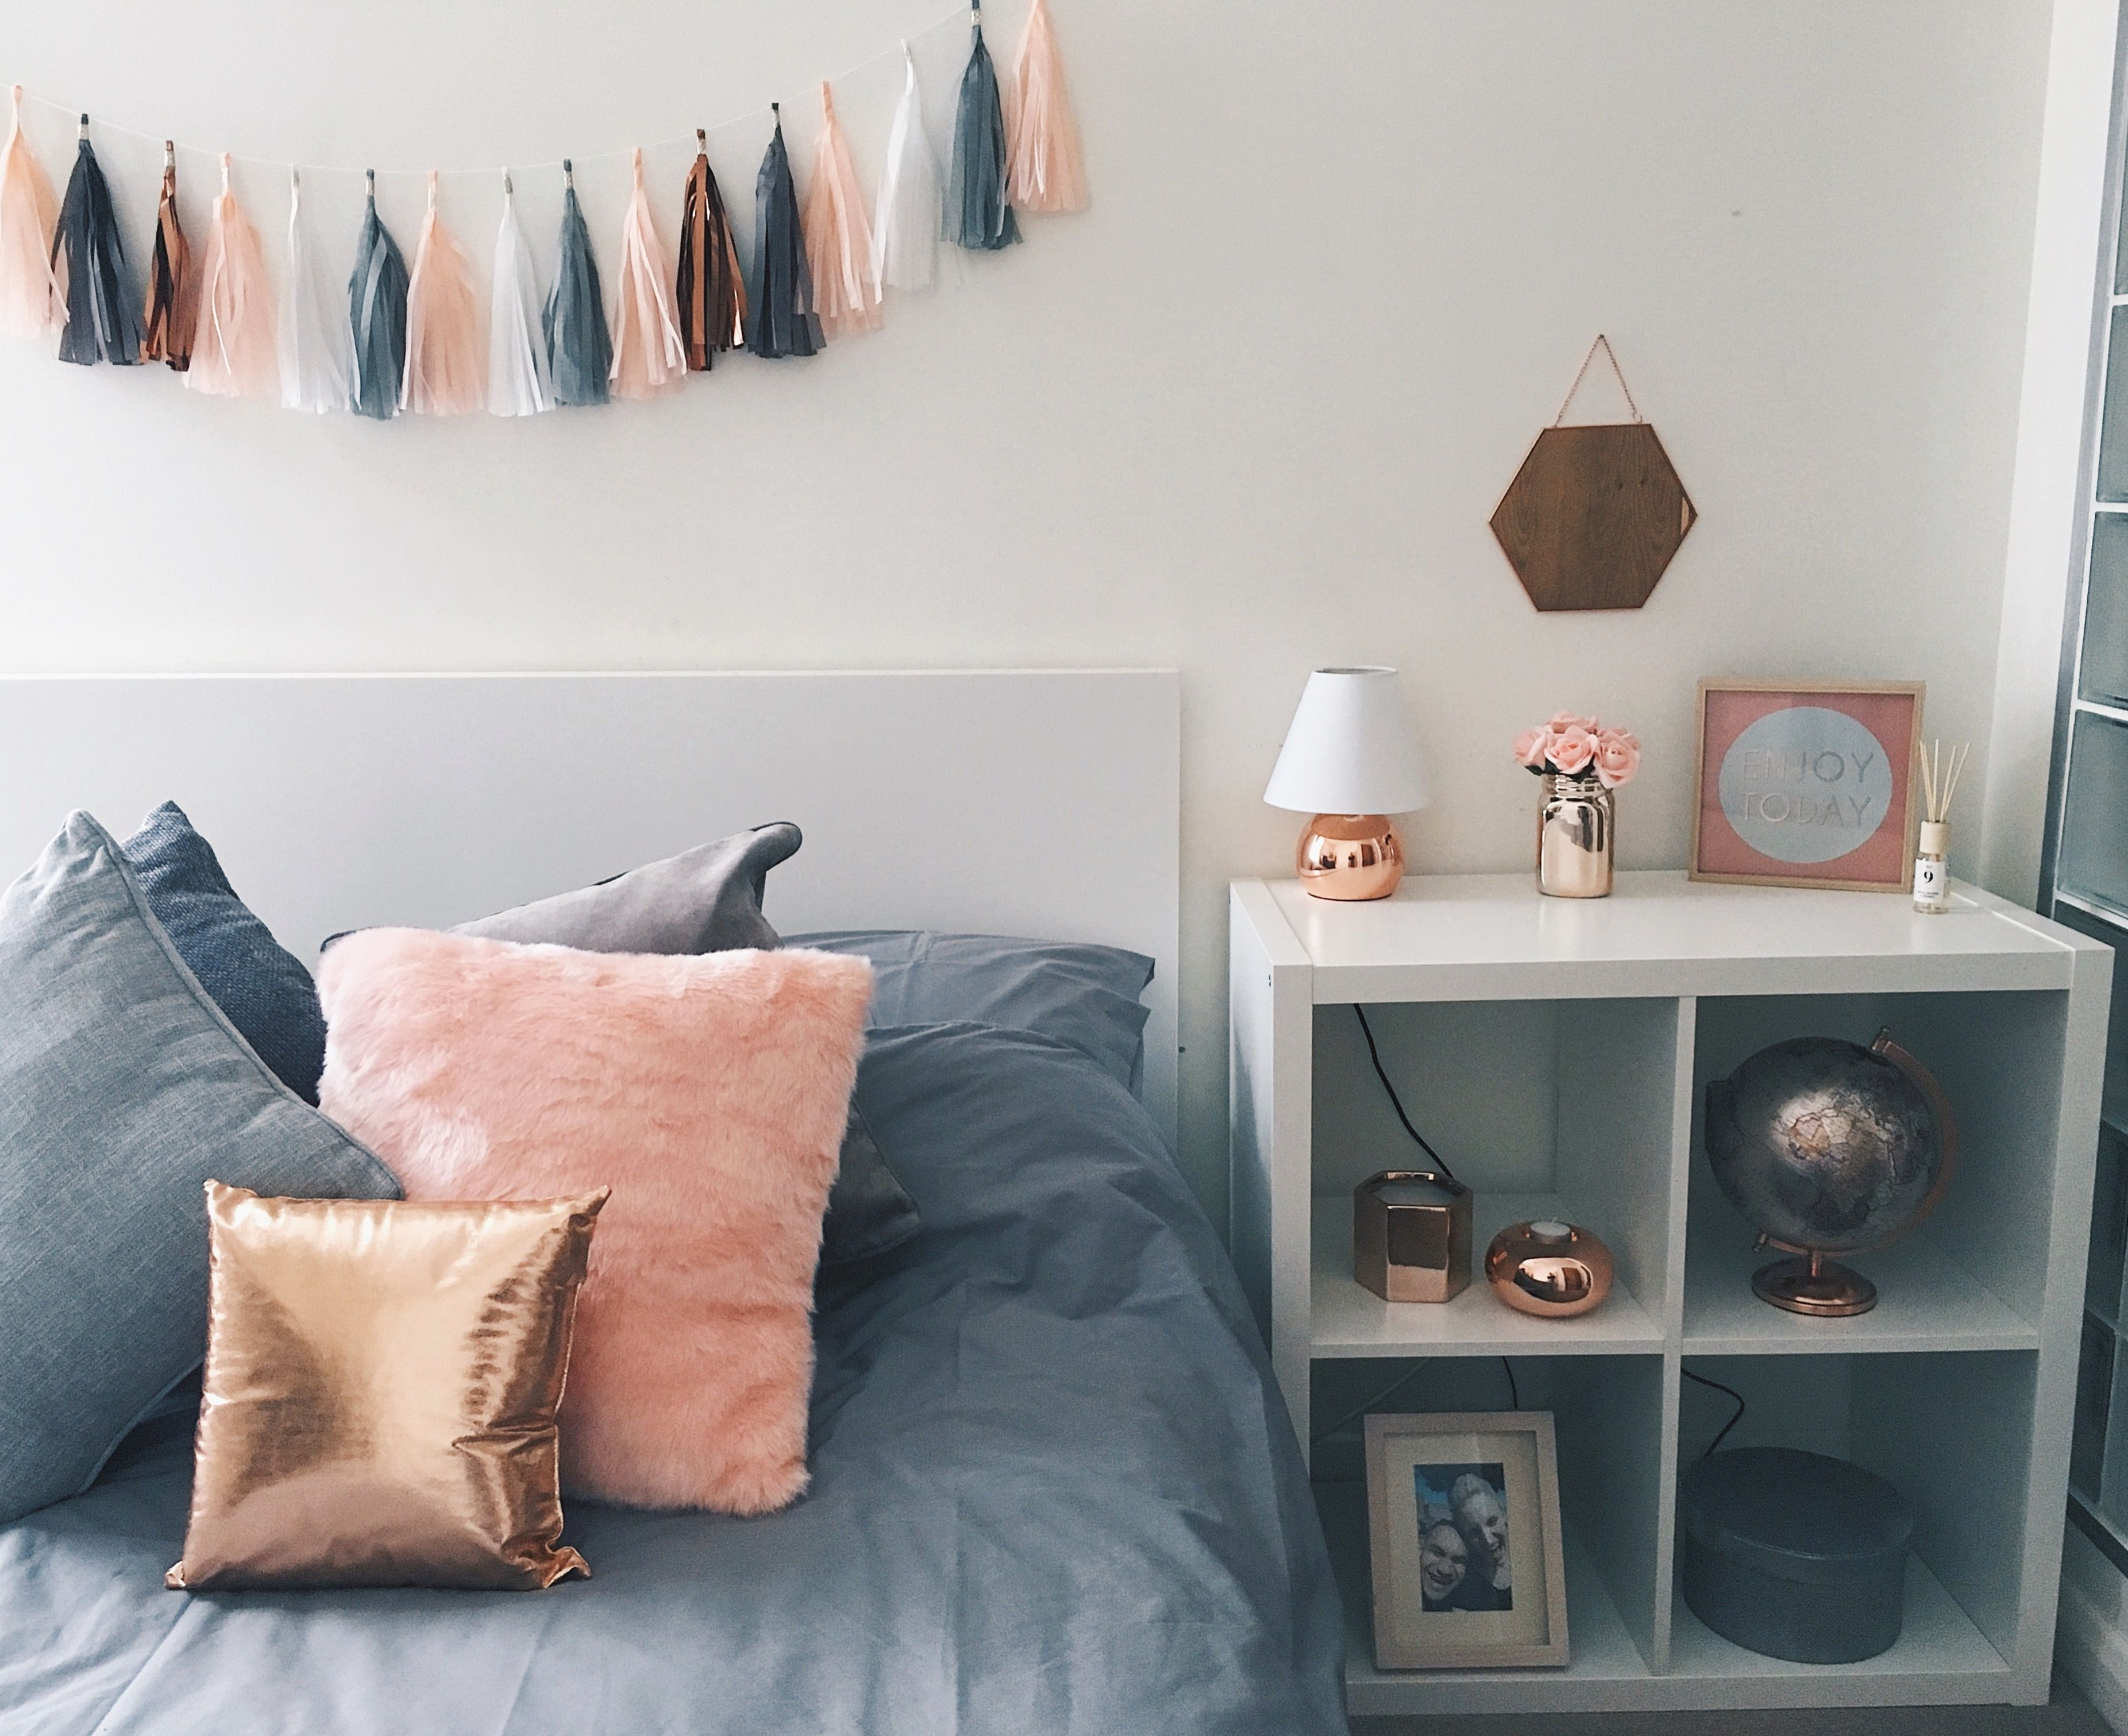 copper decor maison du monde • furniture IKEA • tassel garland